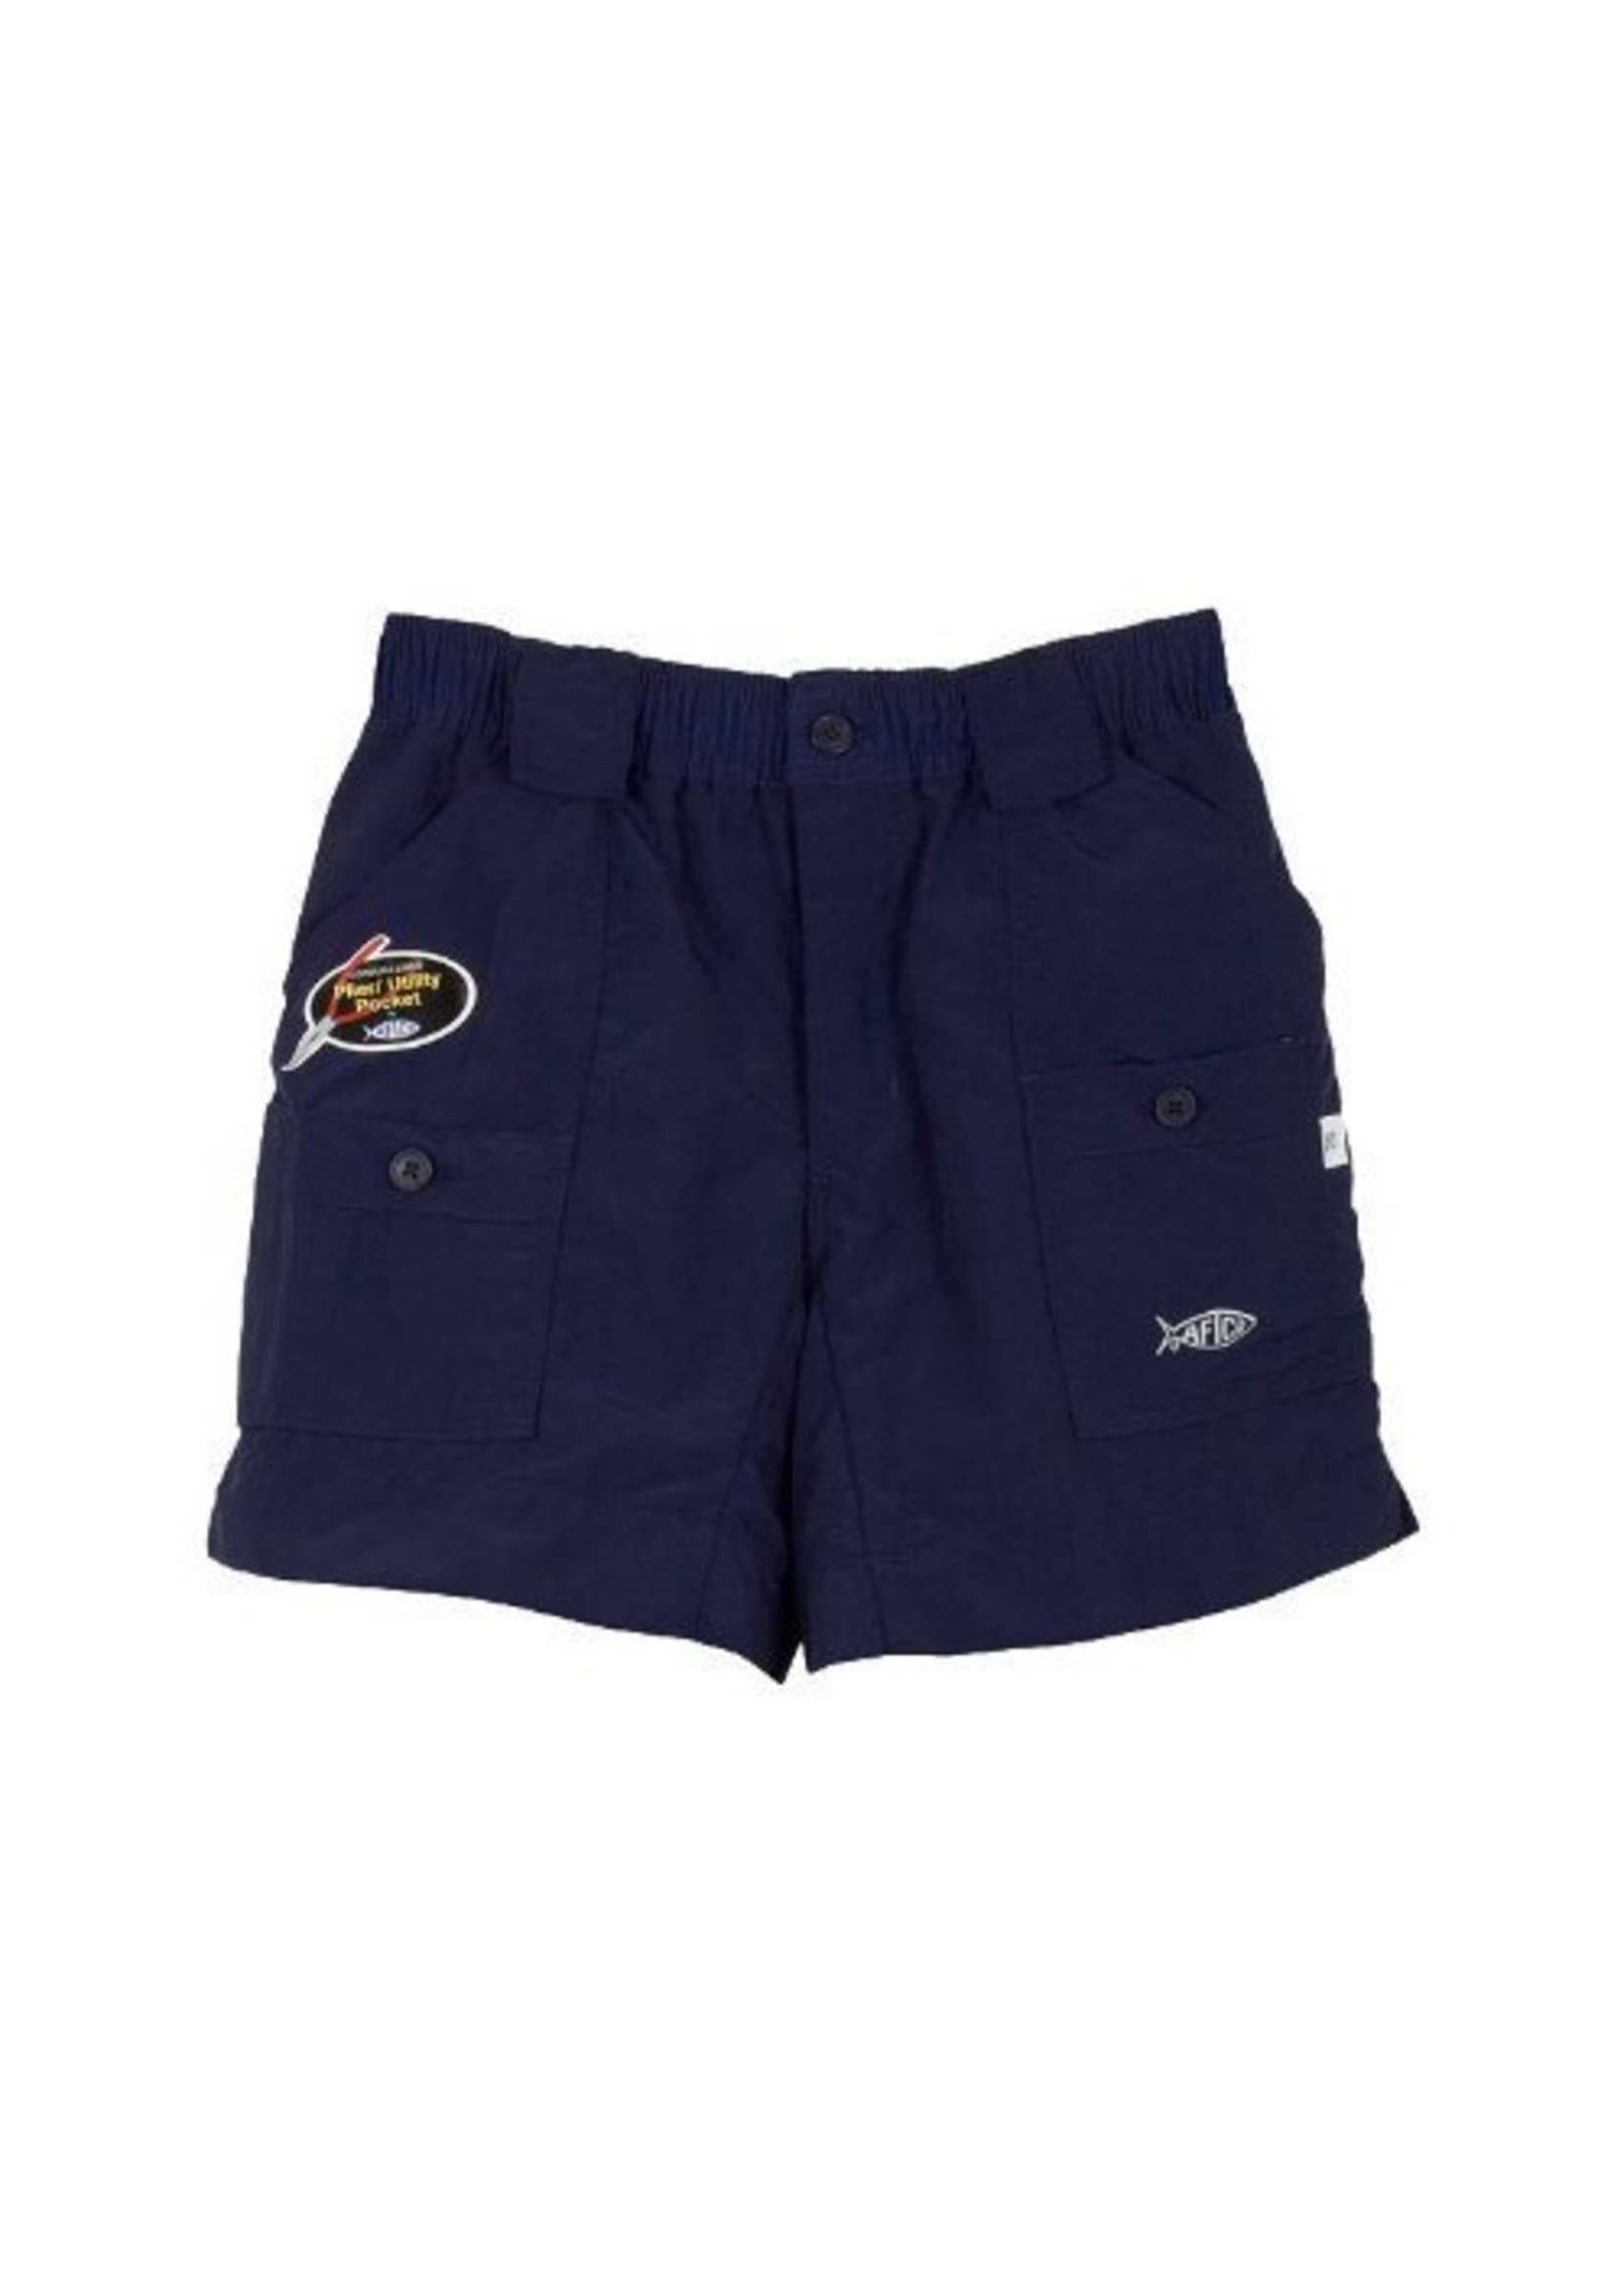 AFTCO Boys Original Fishing Shorts